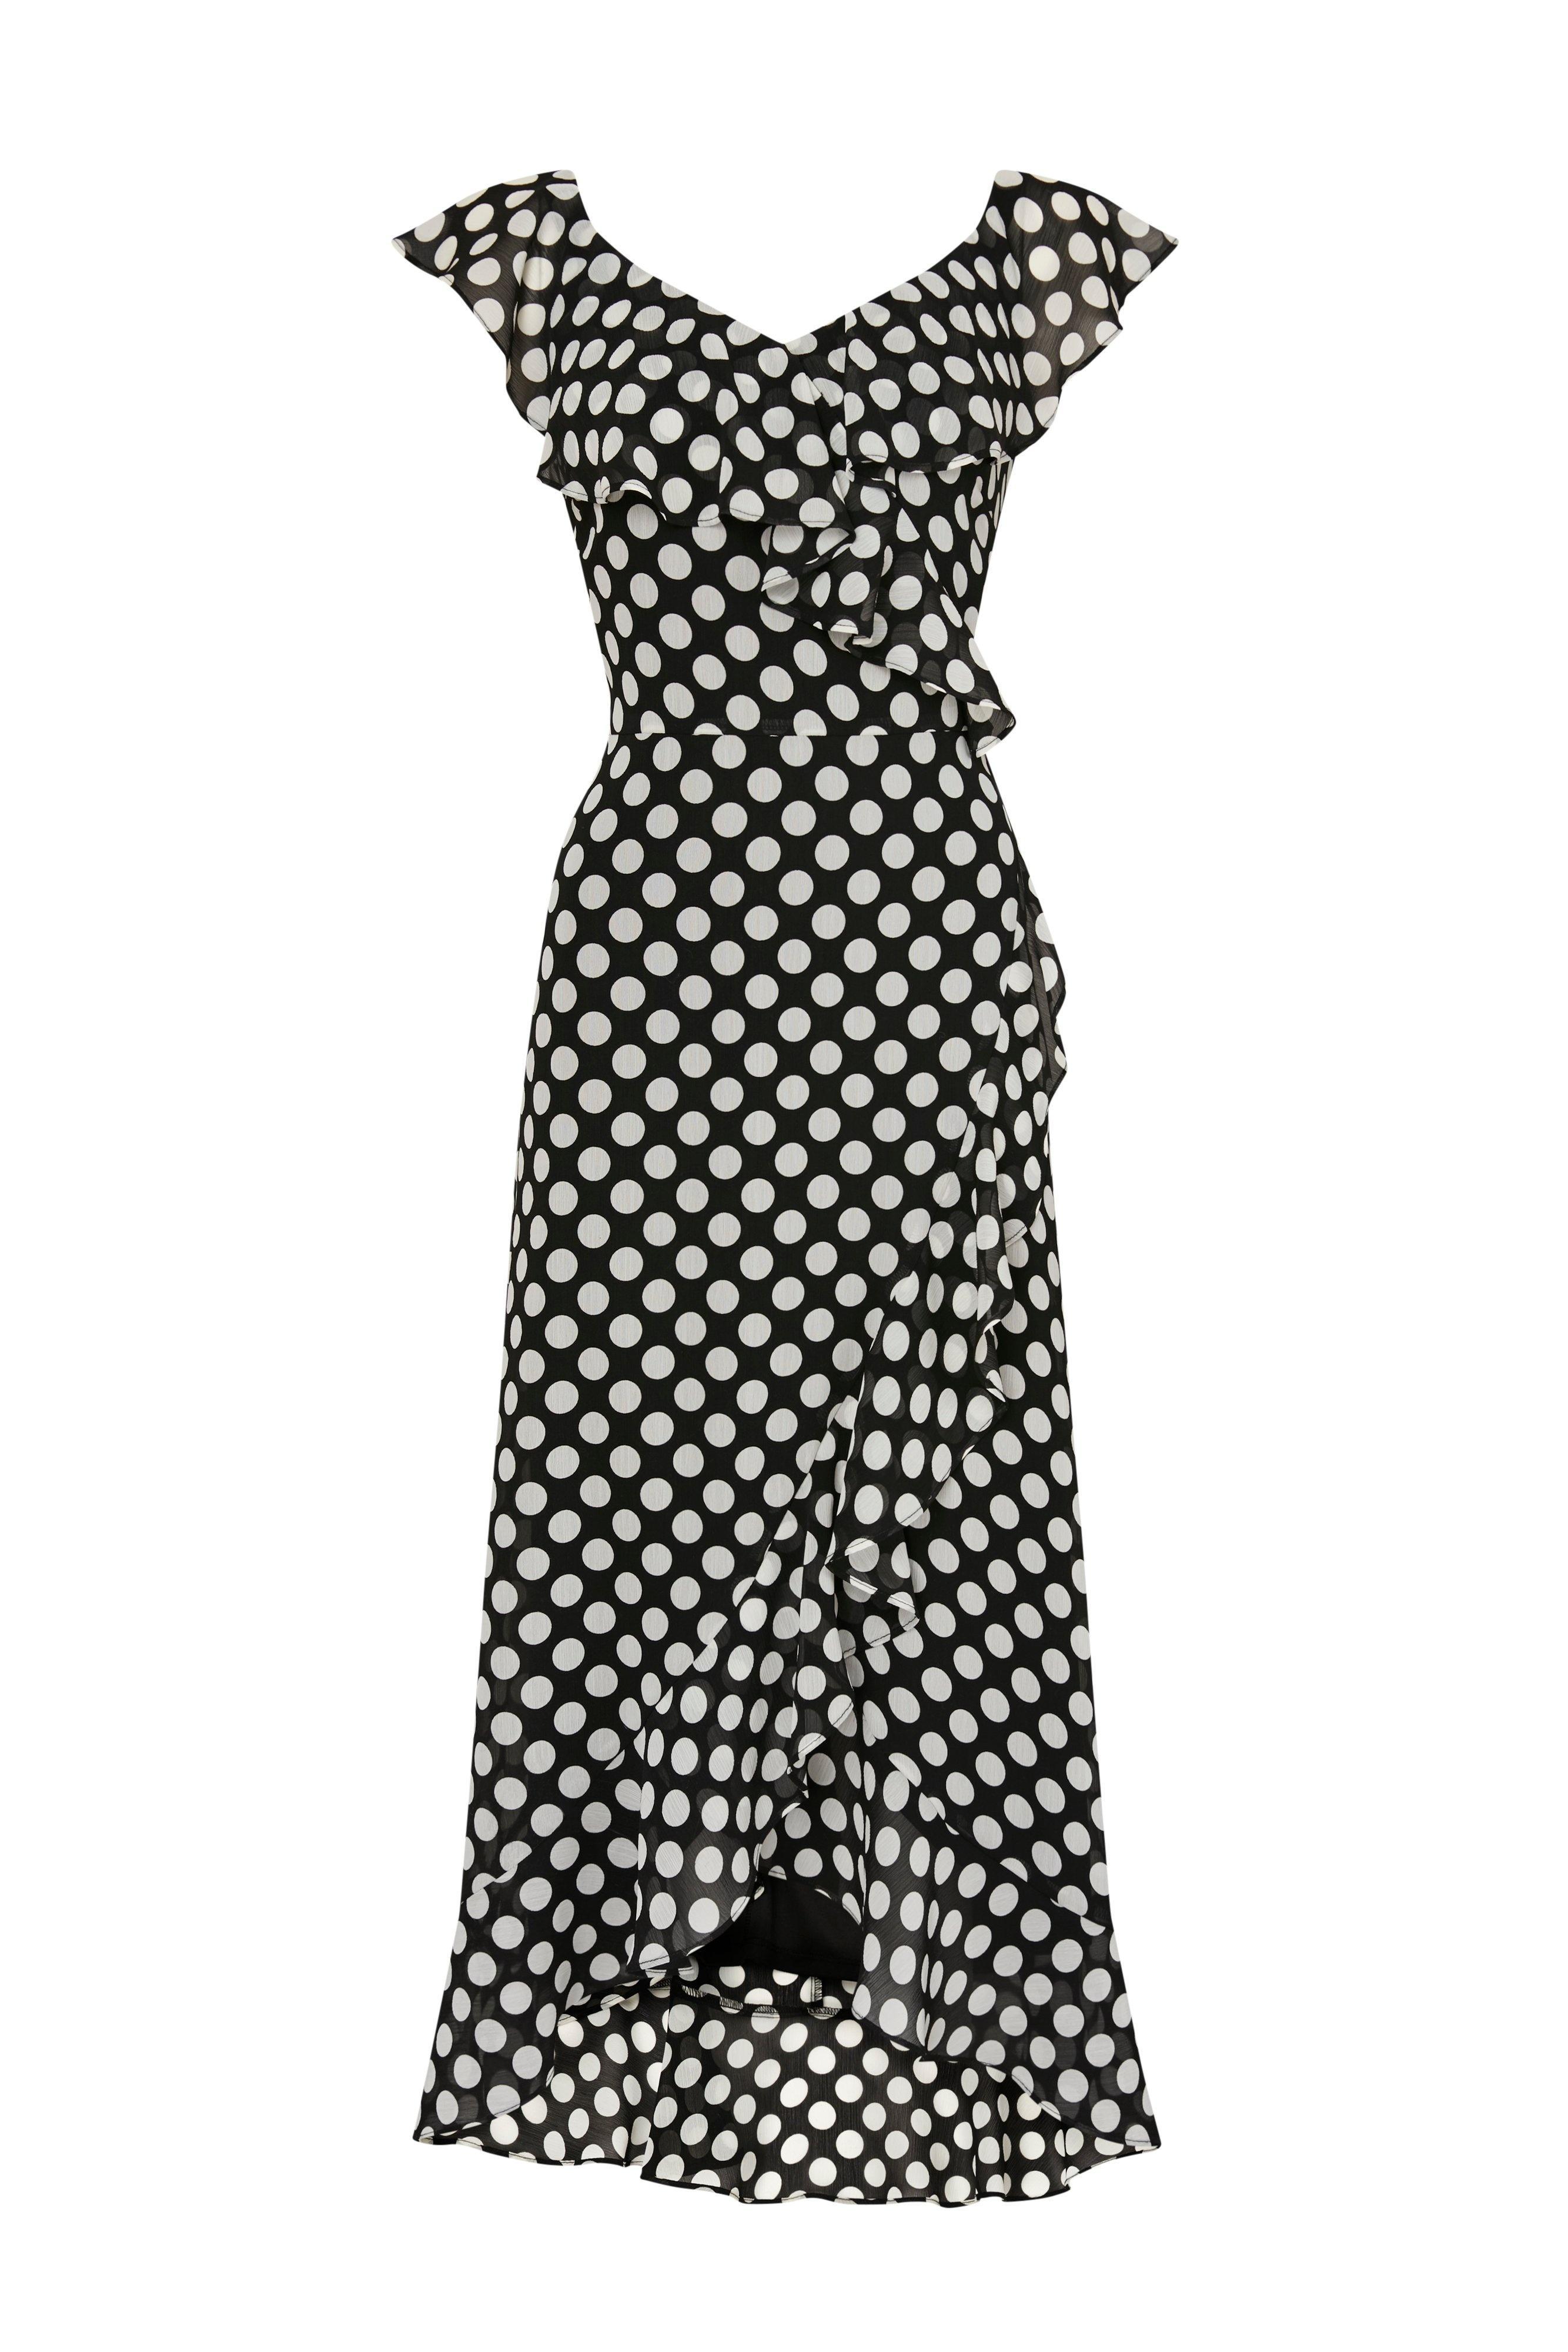 Wallis Synthetic Black Spot Ruffle Dress Lyst